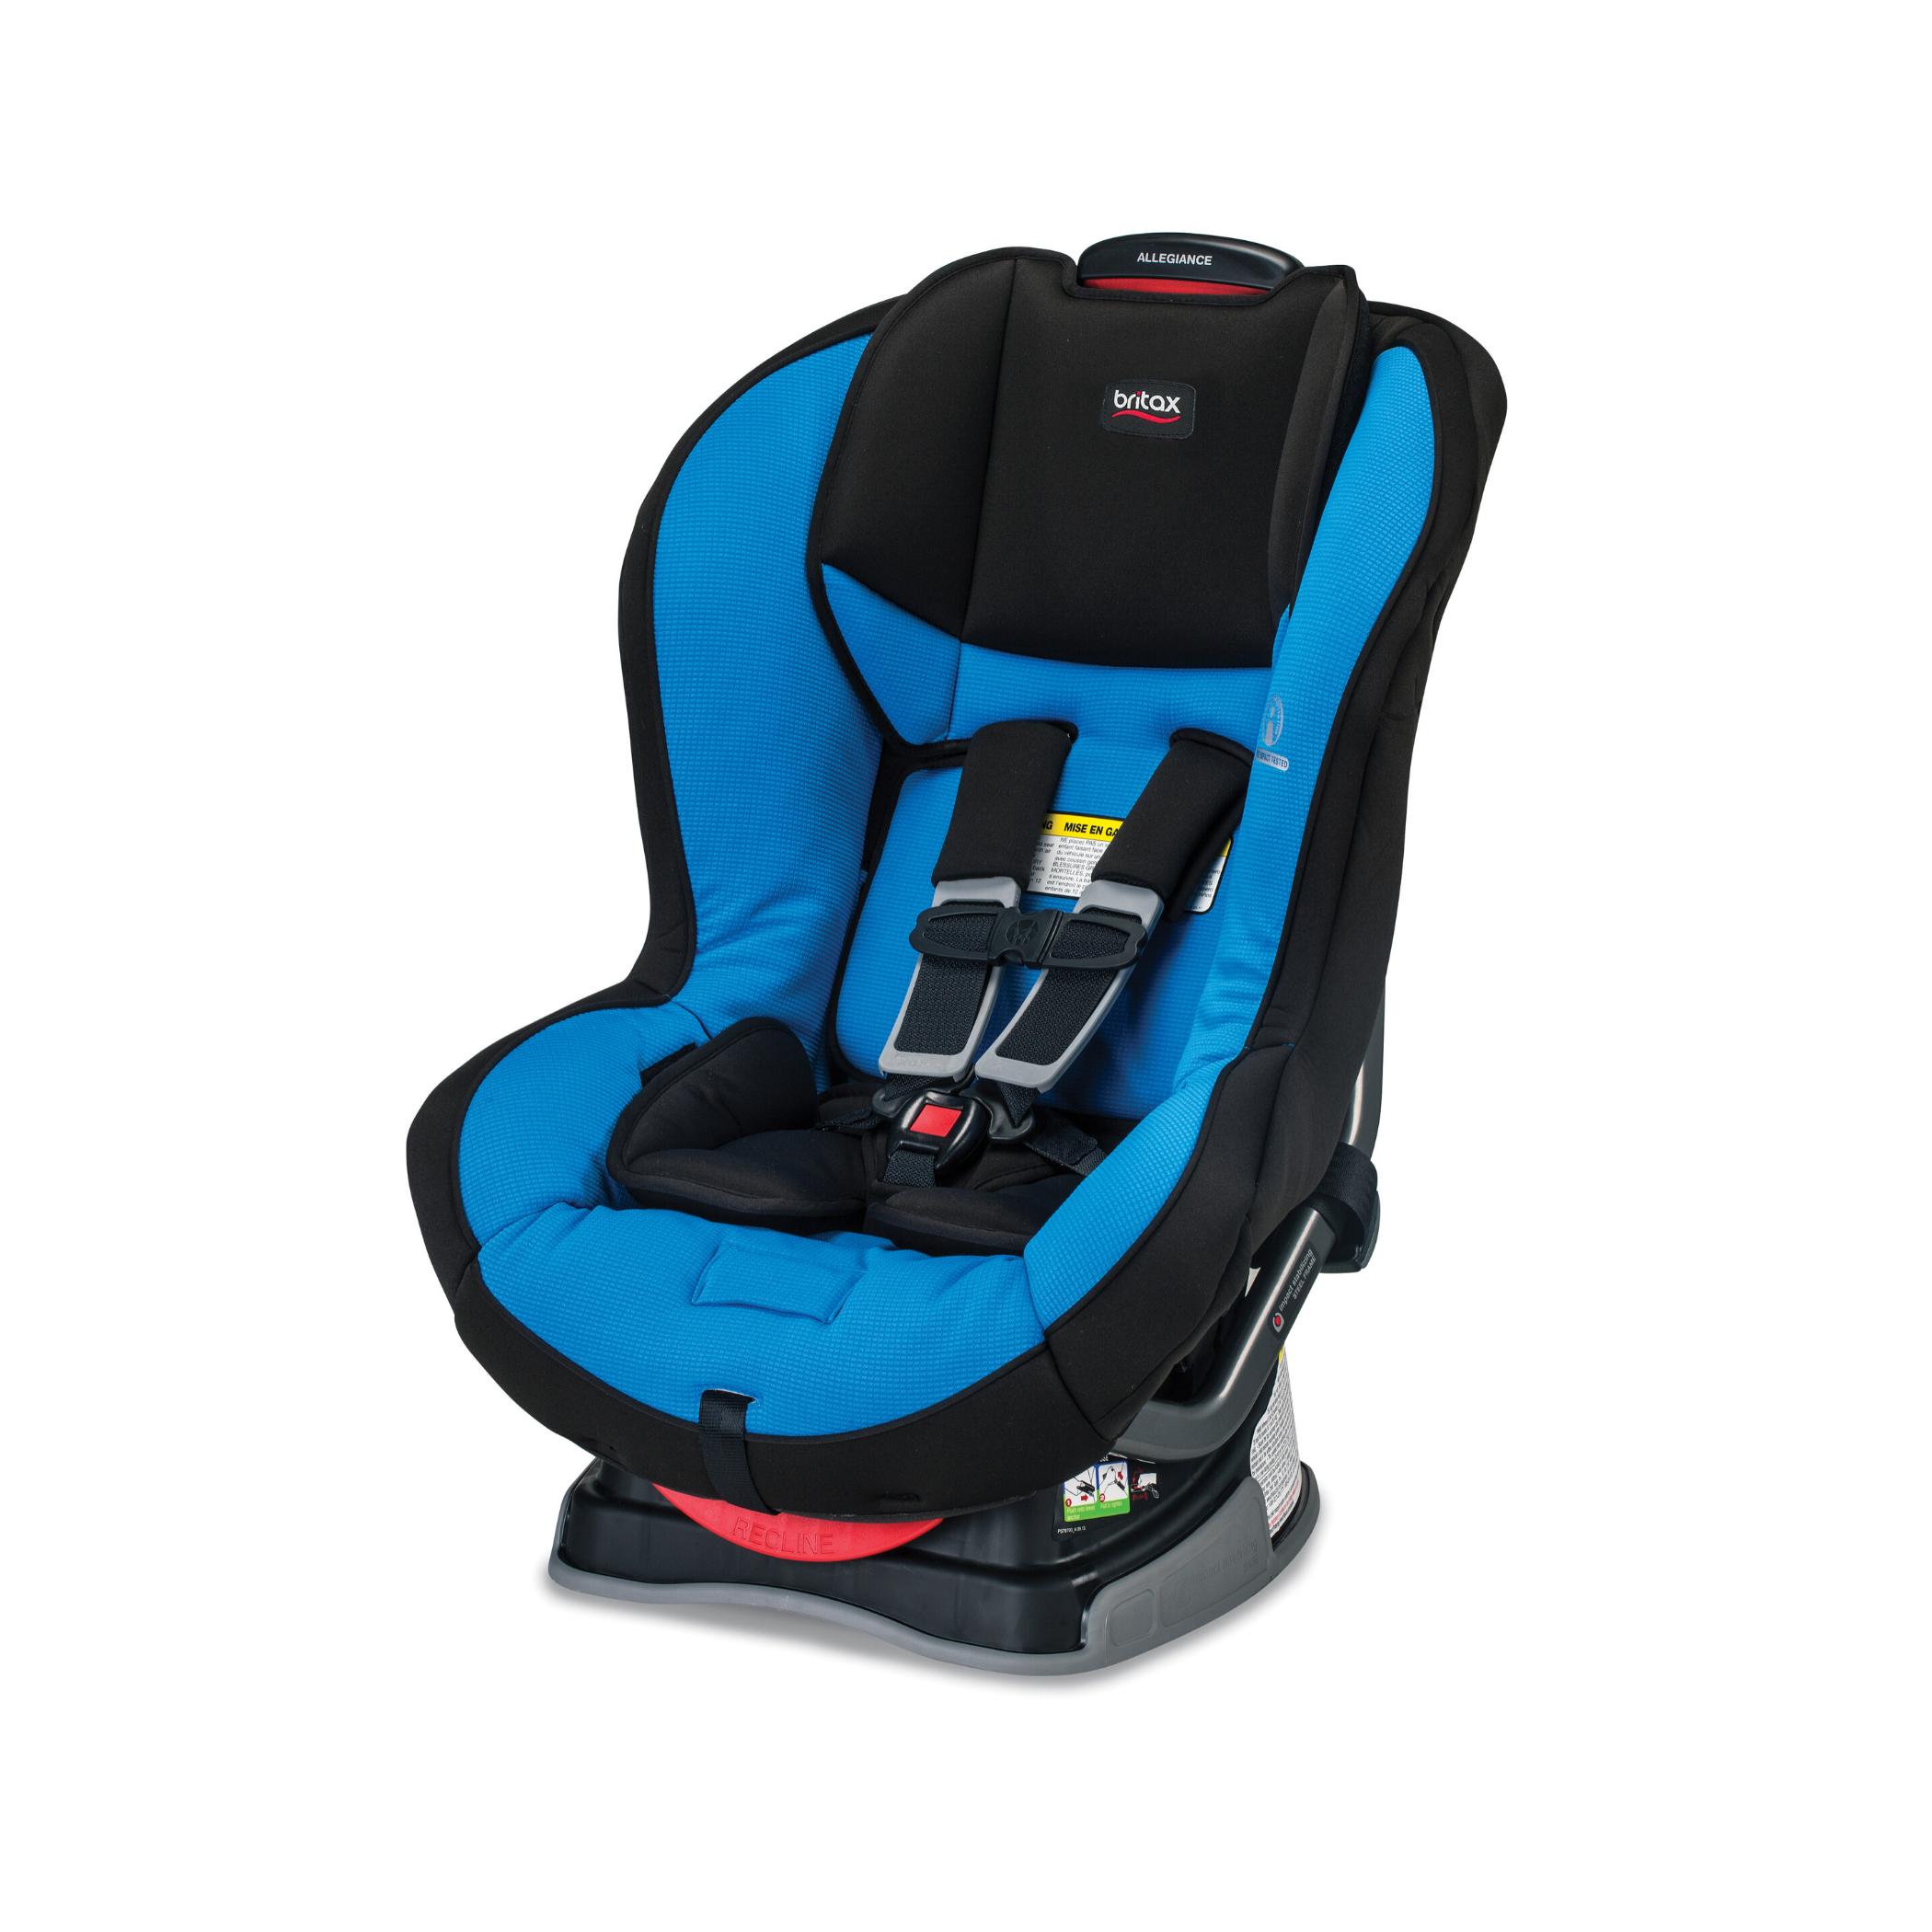 Allegiance Convertible Car Seat Static — britax